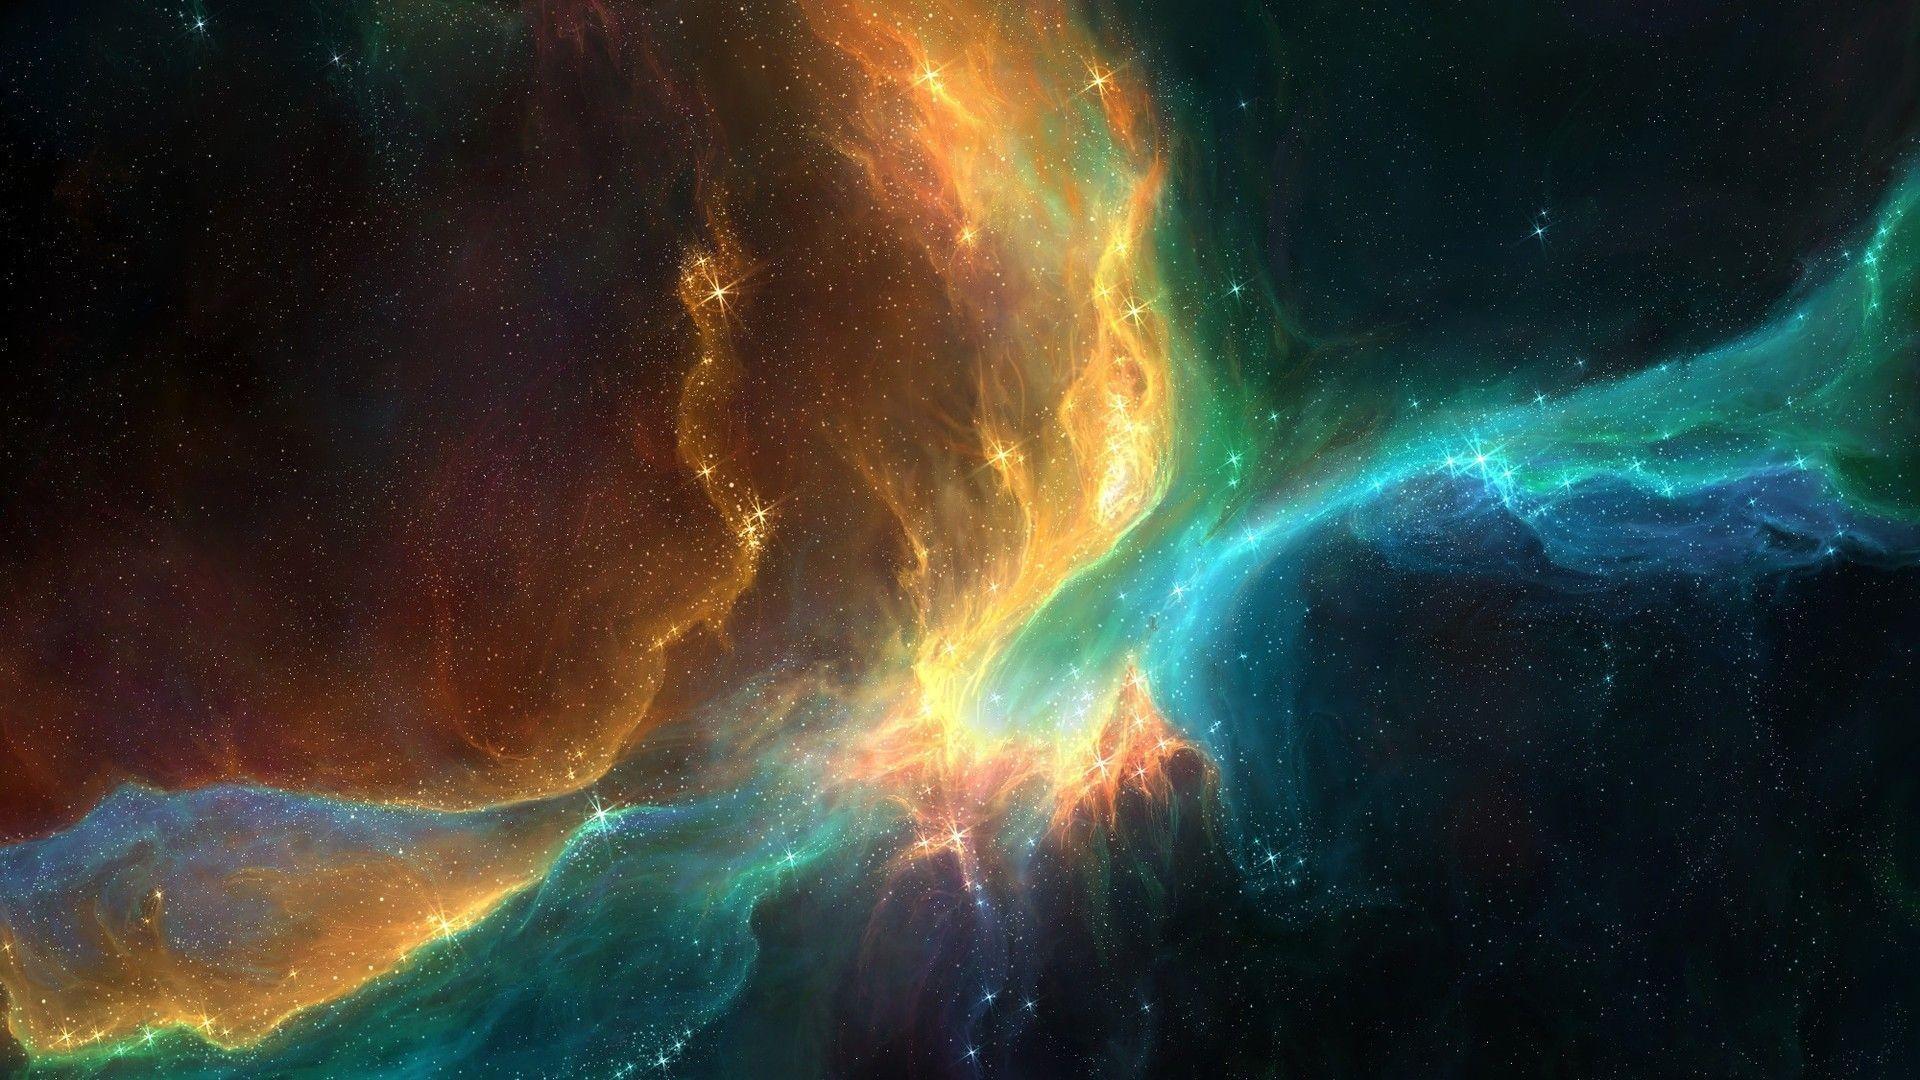 Helix Nebula HD desktop wallpaper : Widescreen : High Definition 1920×1080  Helix Nebula Wallpapers